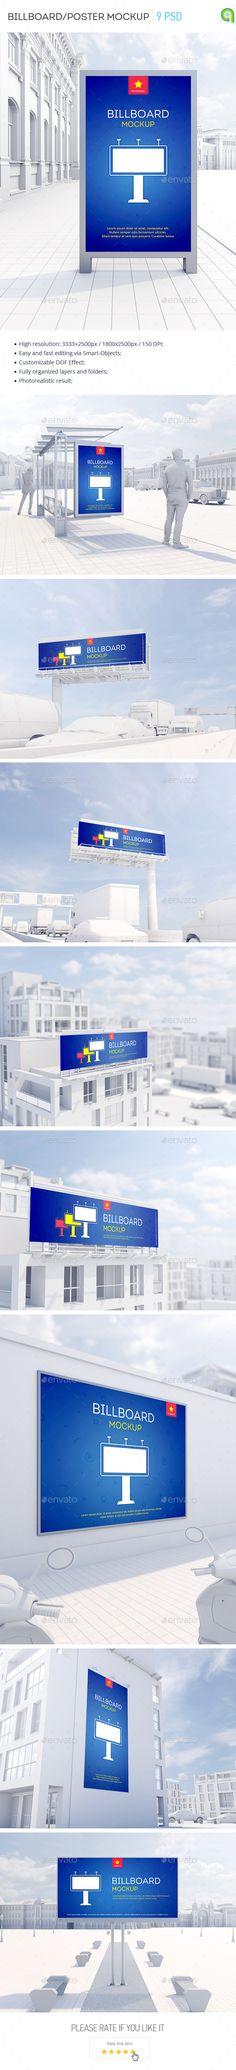 Billboard / Poster Mockup  — PSD Template #billboard #display • Download ➝ https://graphicriver.net/item/billboard-poster-mockup/15037617?ref=pxcr